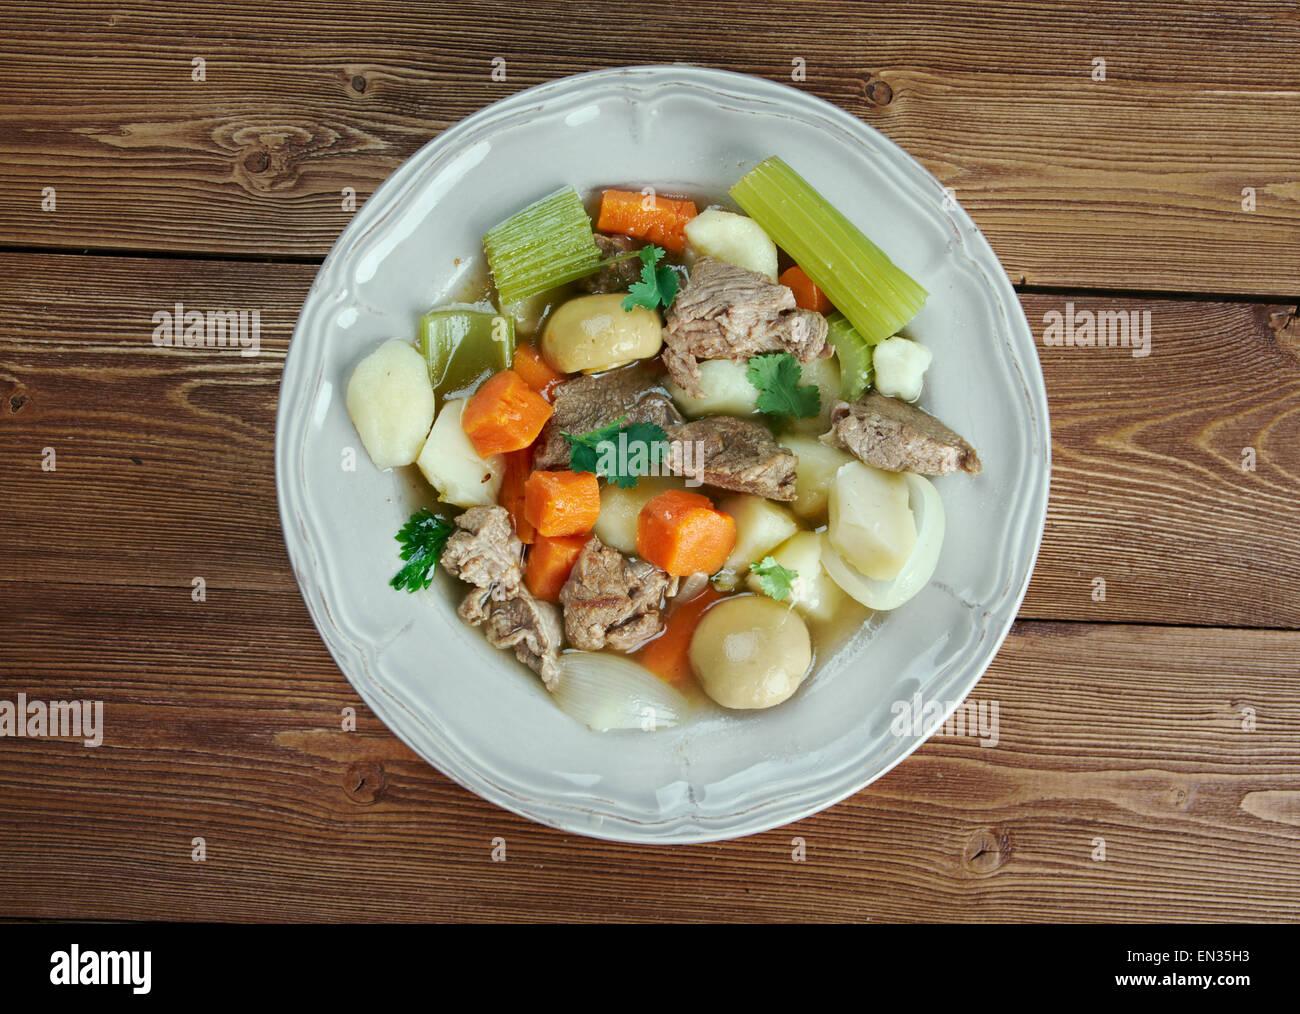 Skirts and kidneys - Irish stew made from pork and pork kidneys. - Stock Image